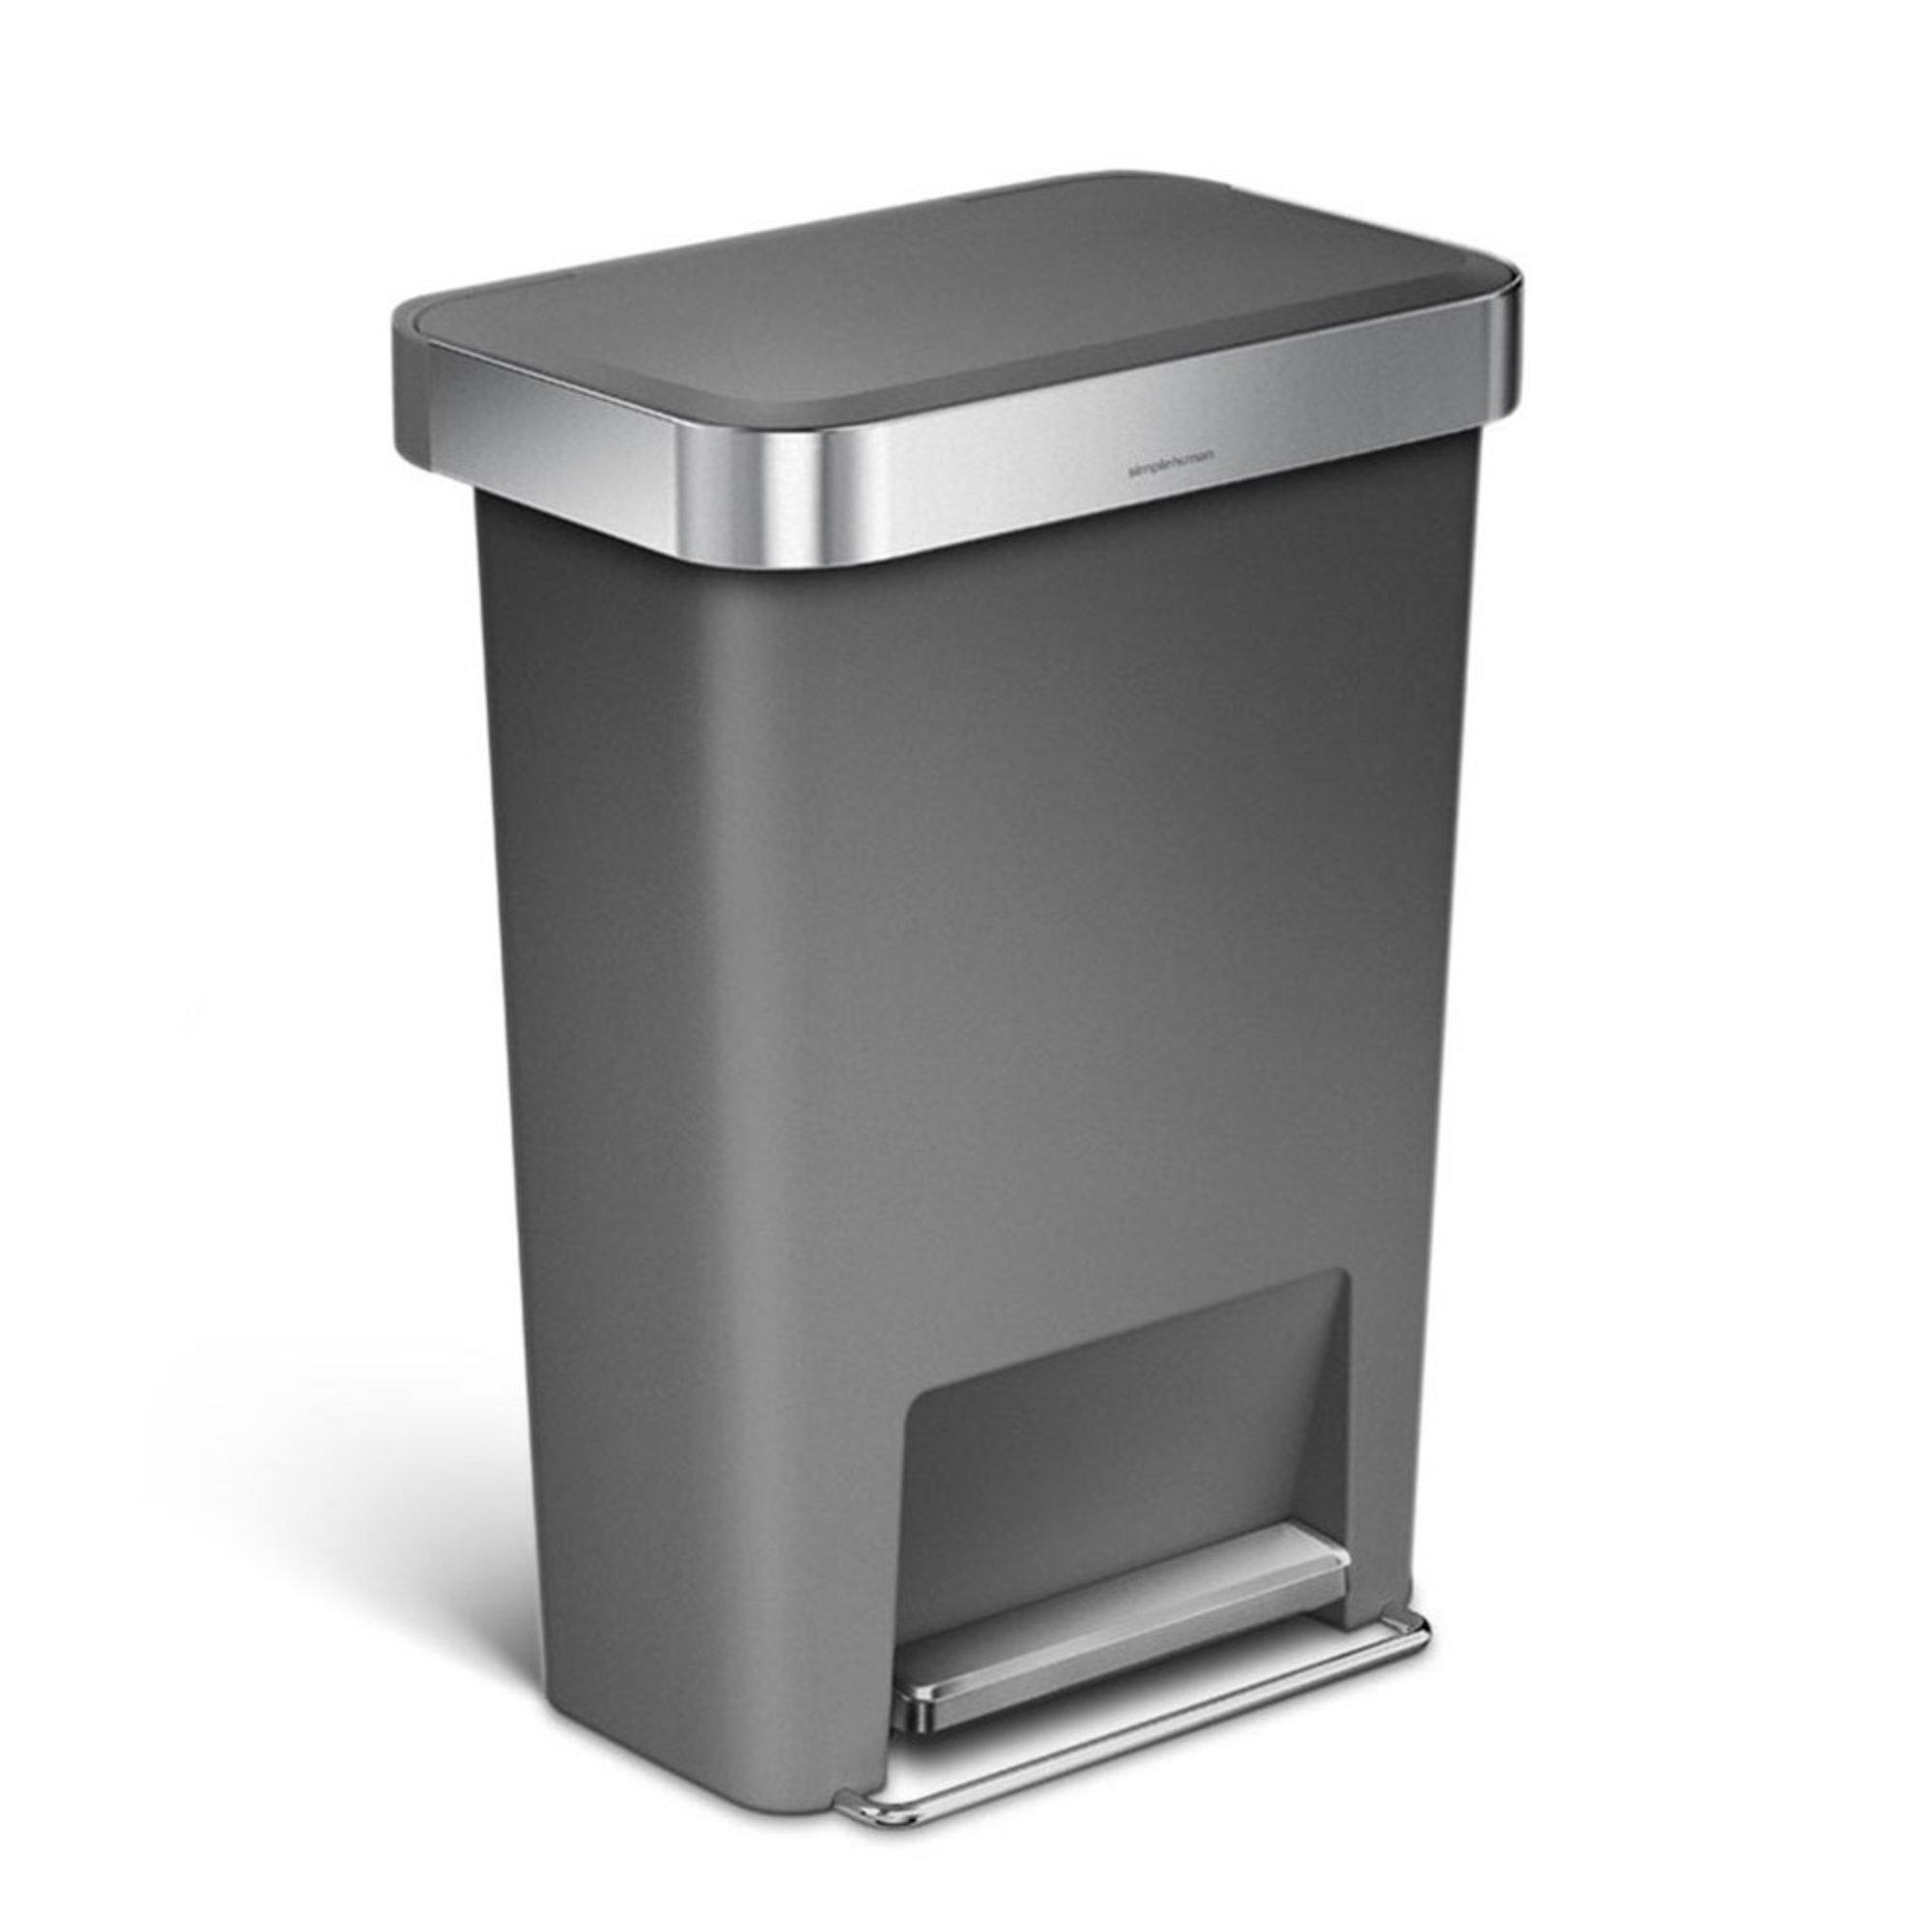 simplehuman 45 liter rectangle step can with liner pocket k liner trash cans recycling bins. Black Bedroom Furniture Sets. Home Design Ideas